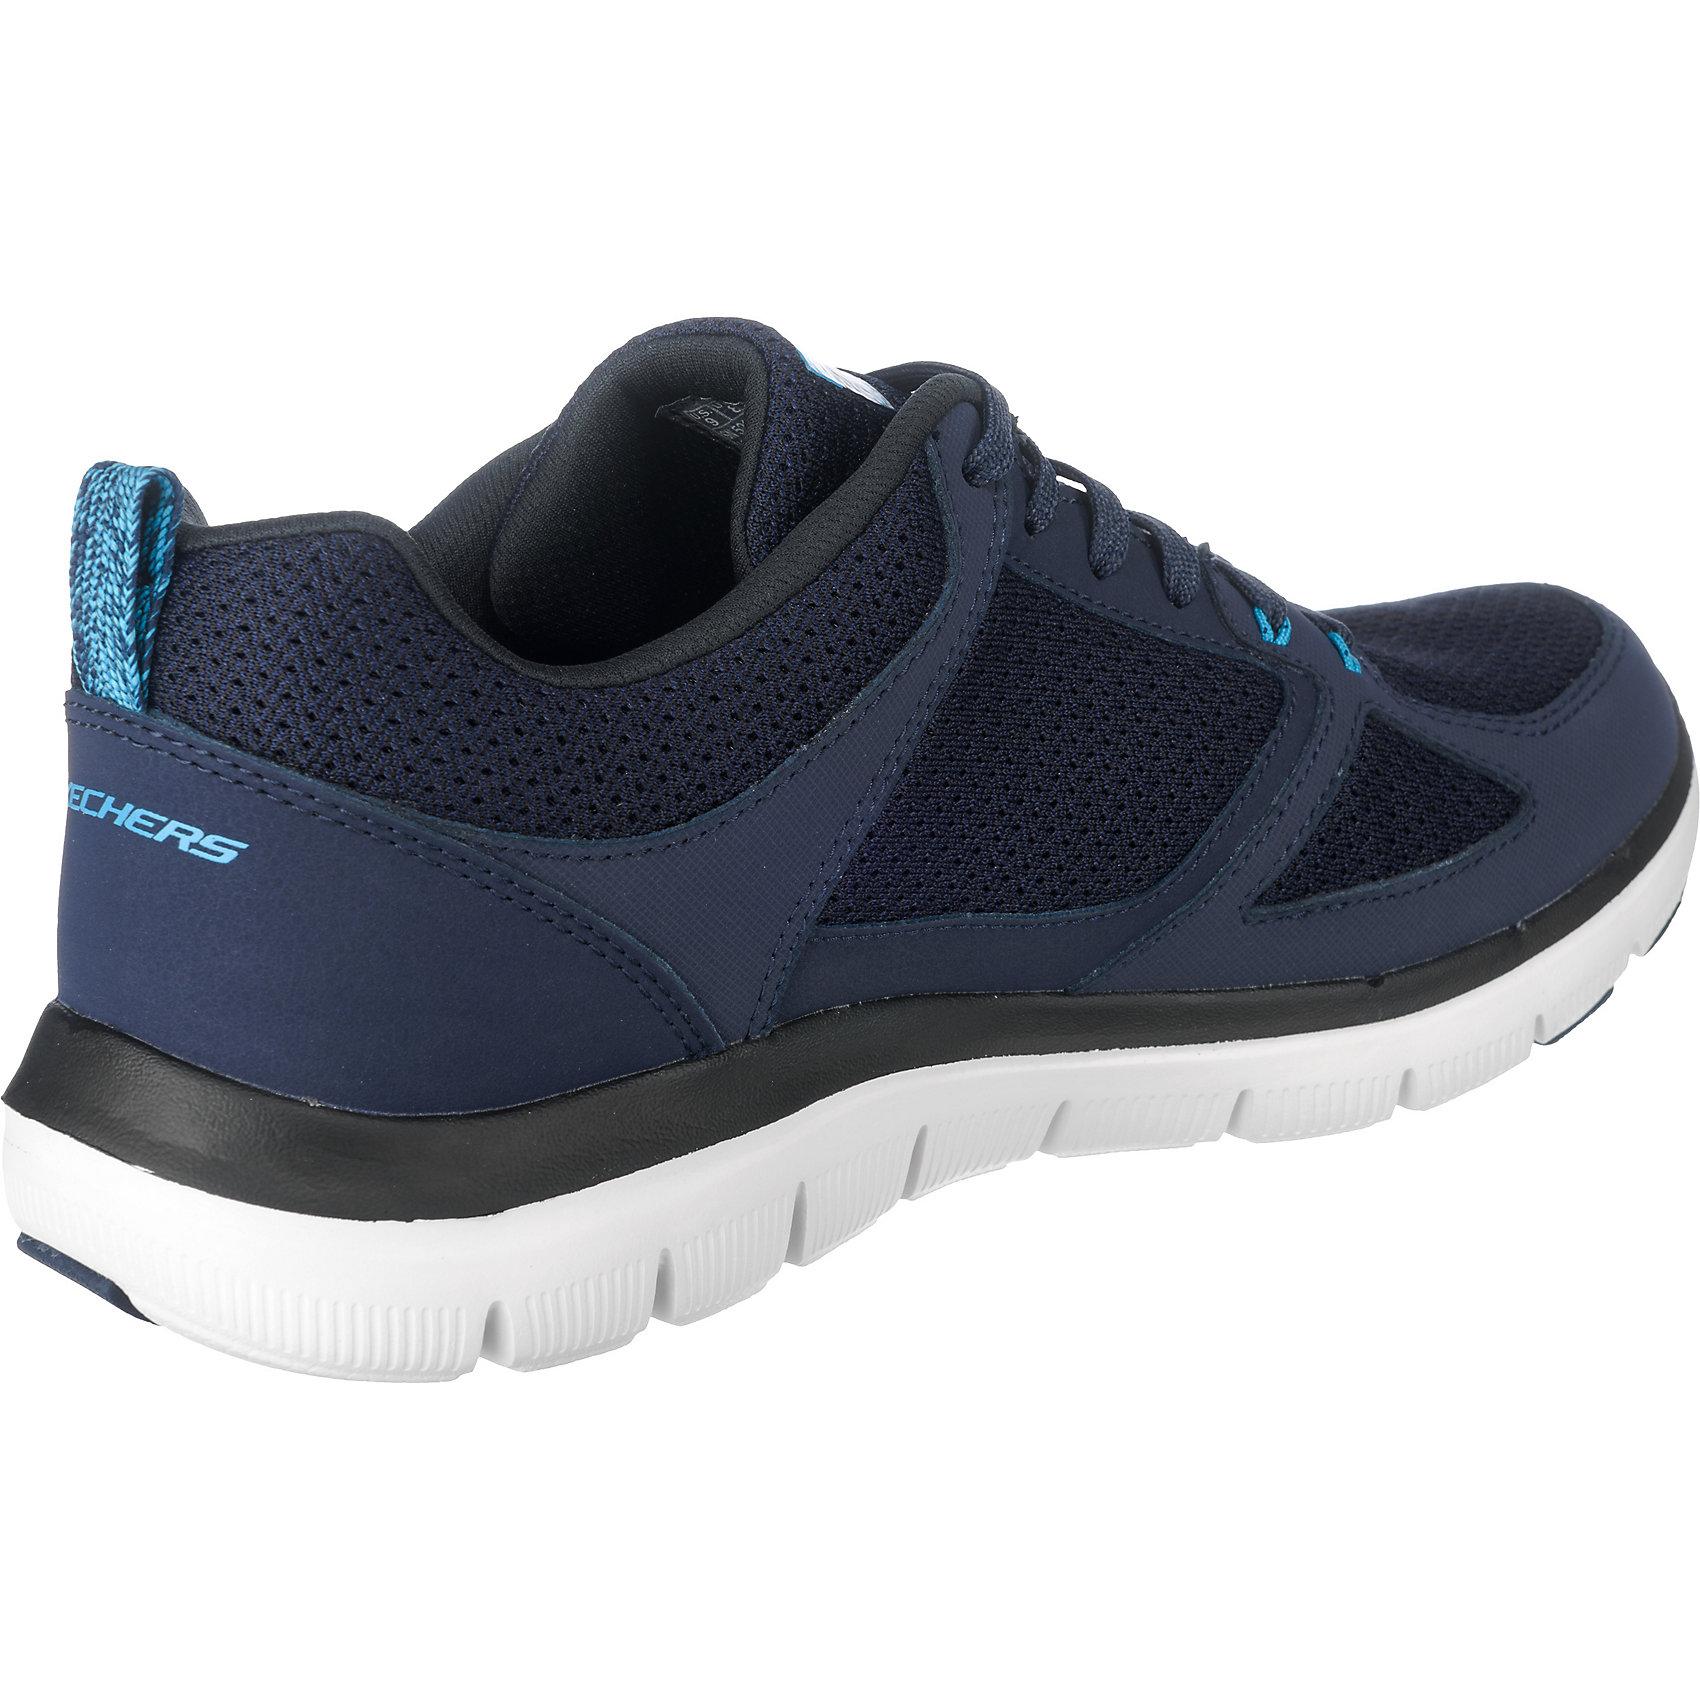 Neu SKECHERS FLEX ADVANTAGE 2.0 Sneakers Low 5764008 für Herren